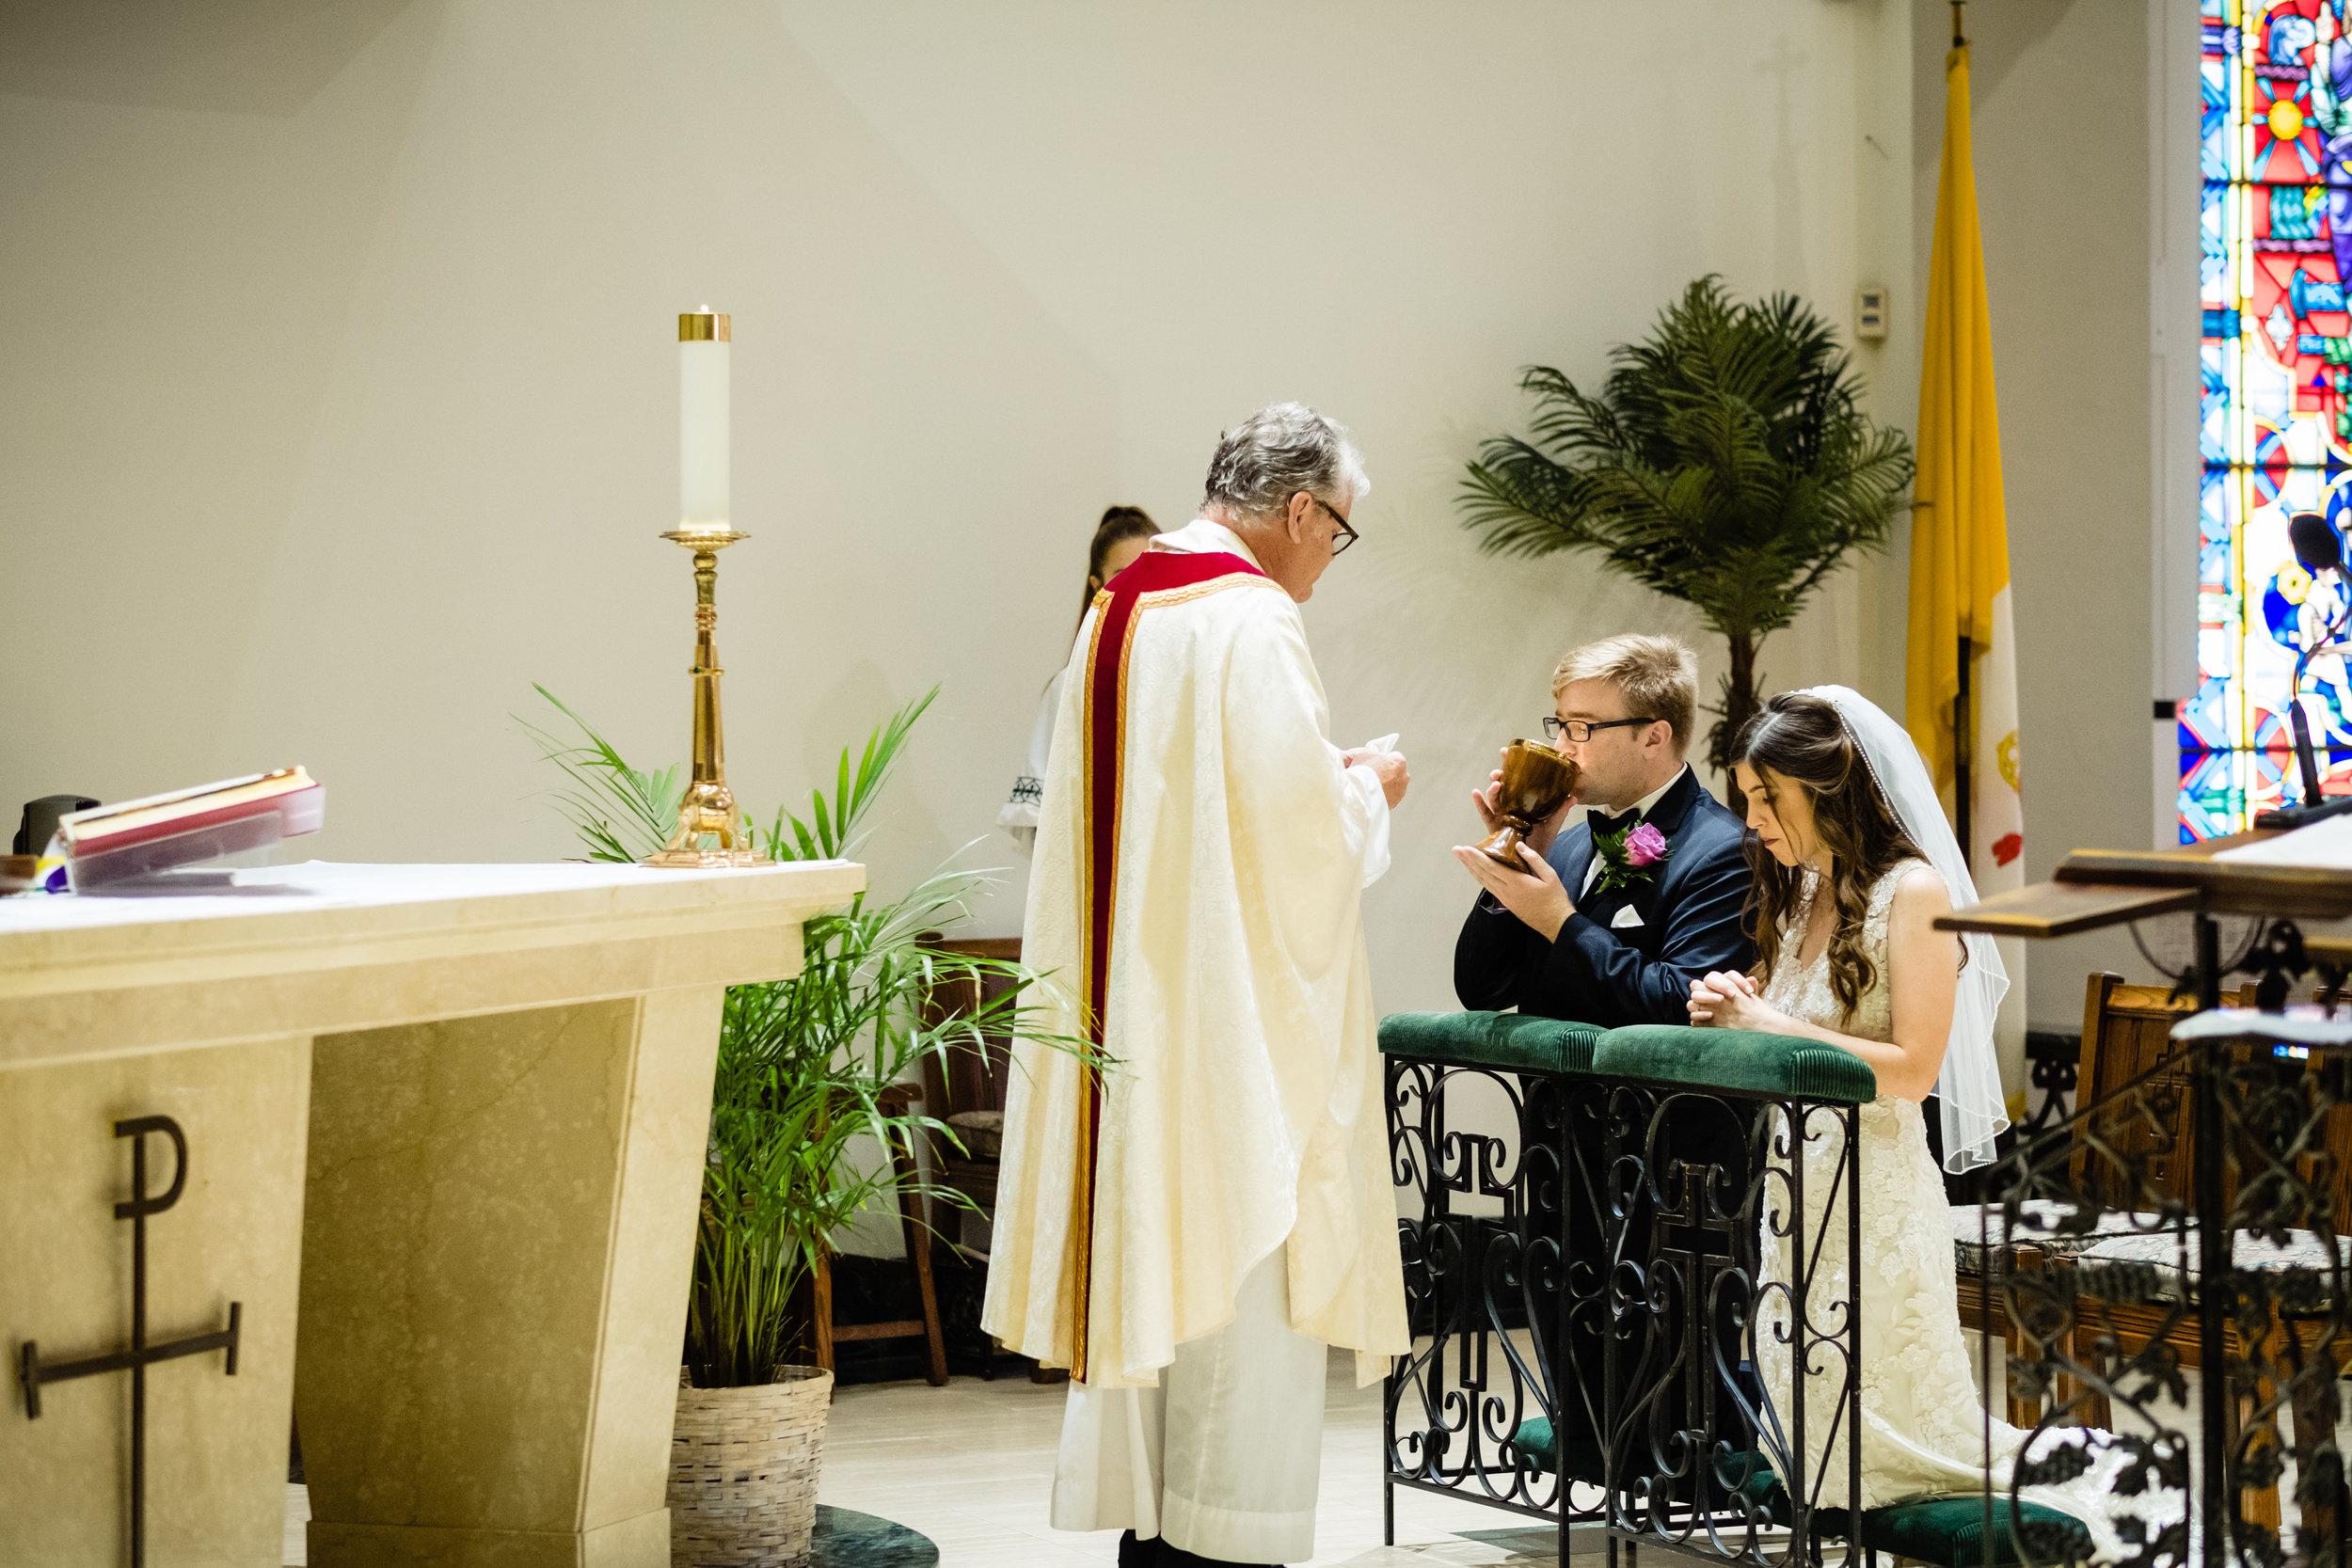 HAH_Zoe and Daniel_Clearwater Wedding_160_2018.jpg